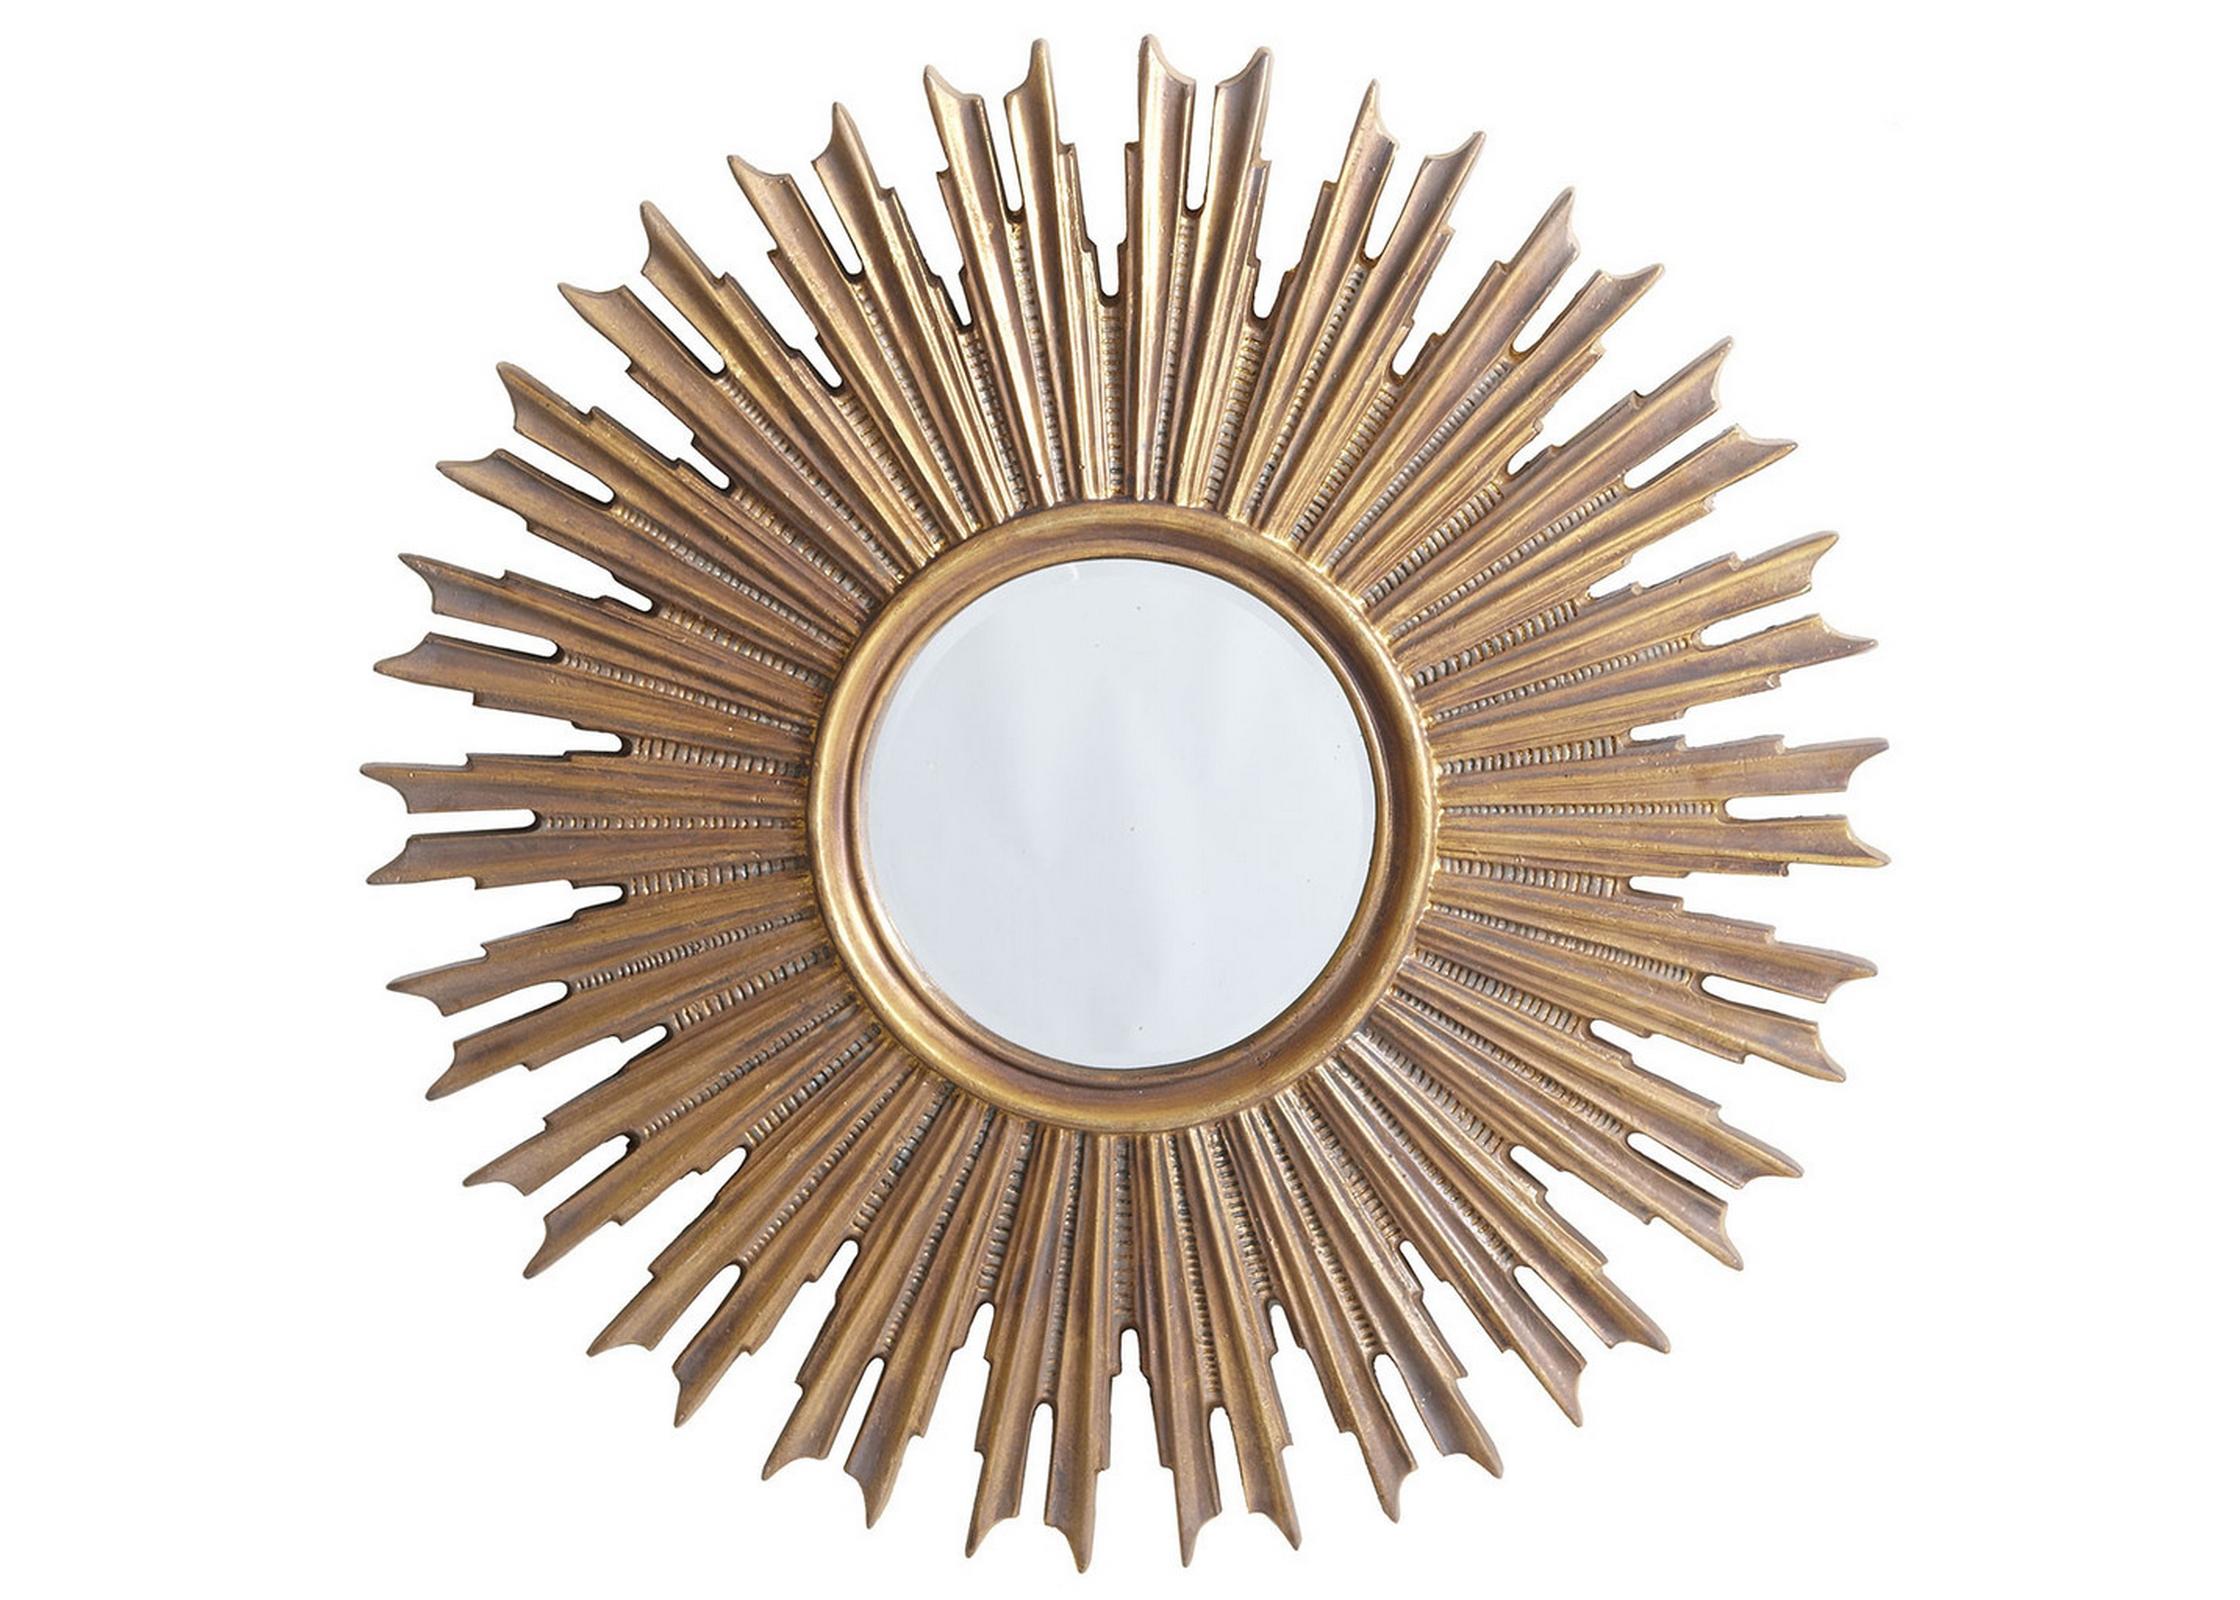 Зеркало ЭллисонНастенные зеркала<br>Материал: дерево, полиуретан.<br><br>Material: Пластик<br>Depth см: 3<br>Diameter см: 100